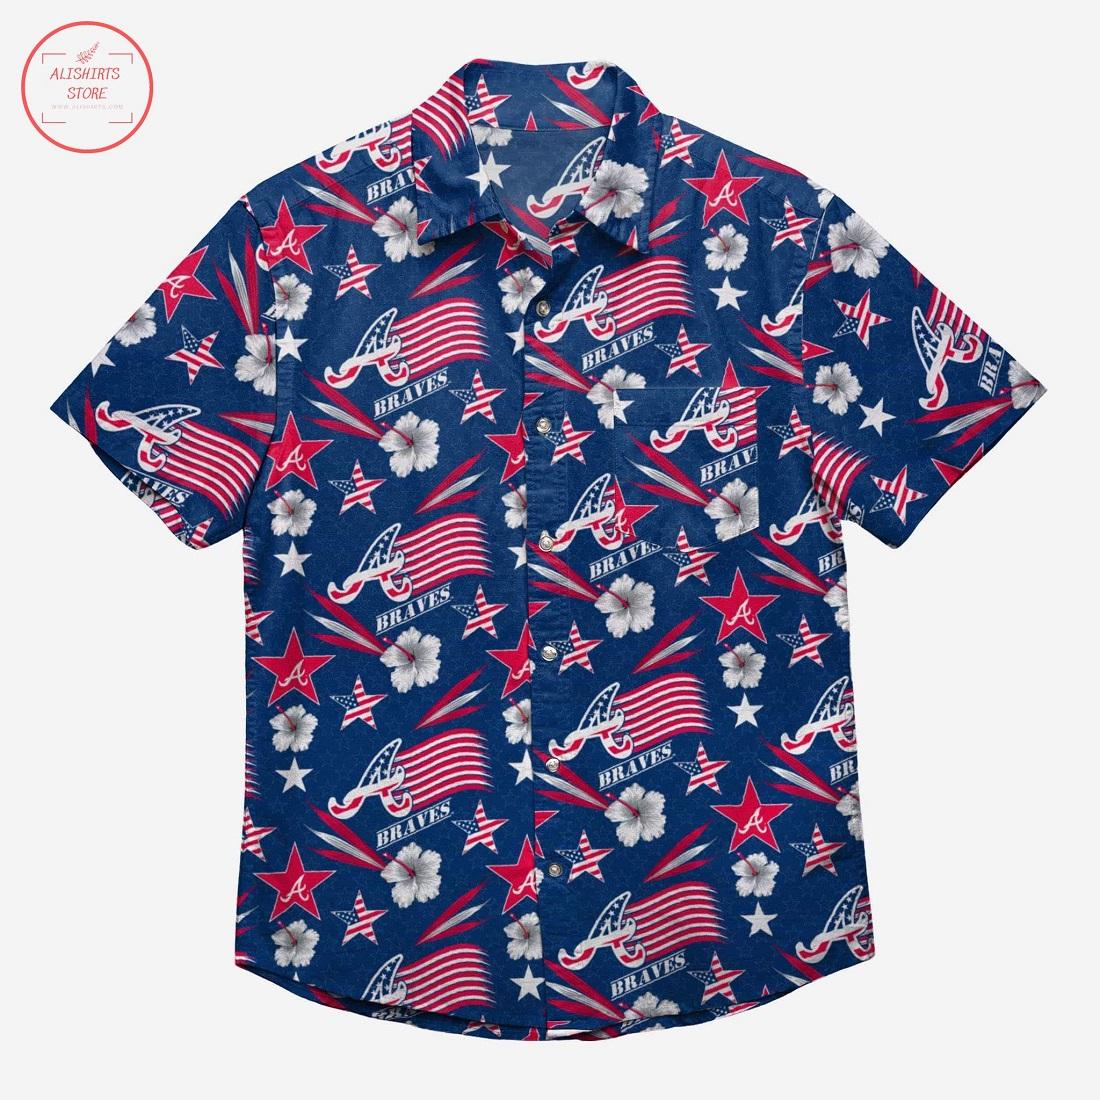 Atlanta Braves Americana Hawaiian shirt